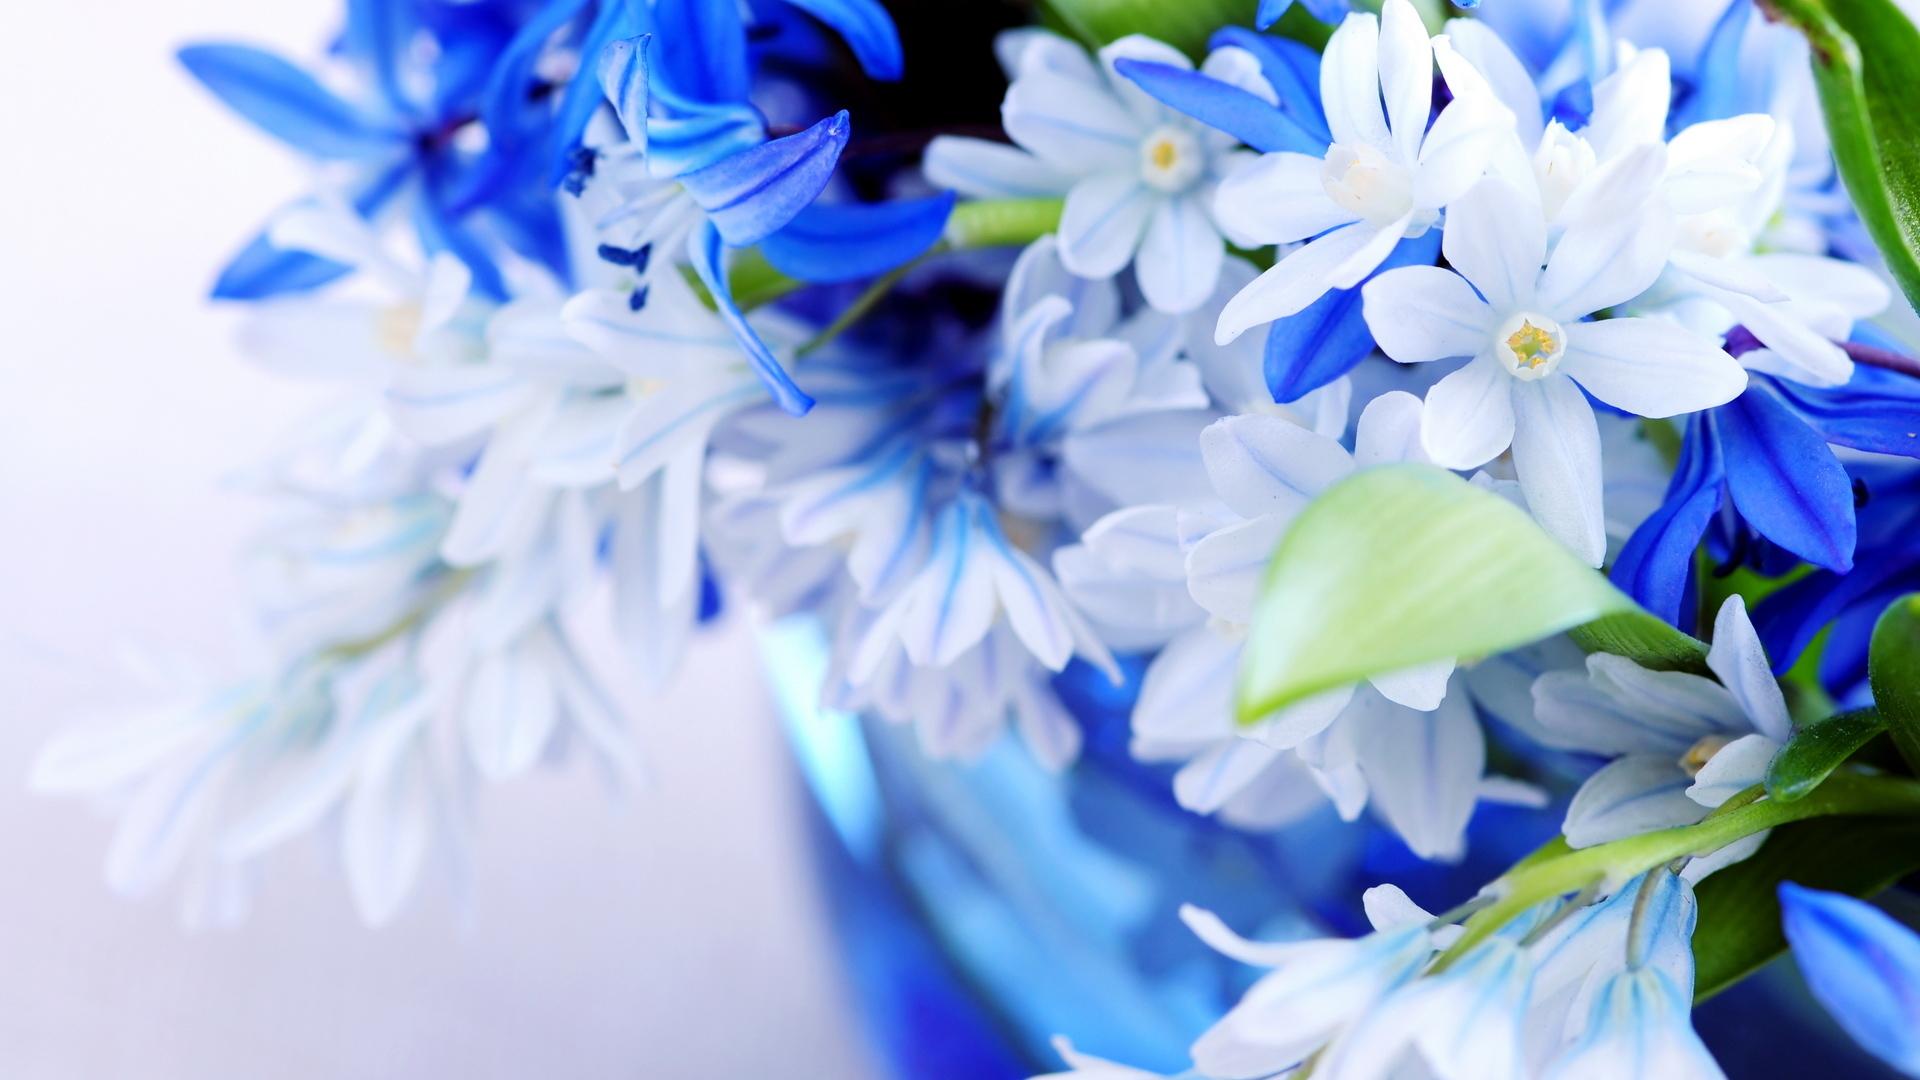 Full Screen Flowers 7785 Wallpaper Wallpaper hd 1920x1080